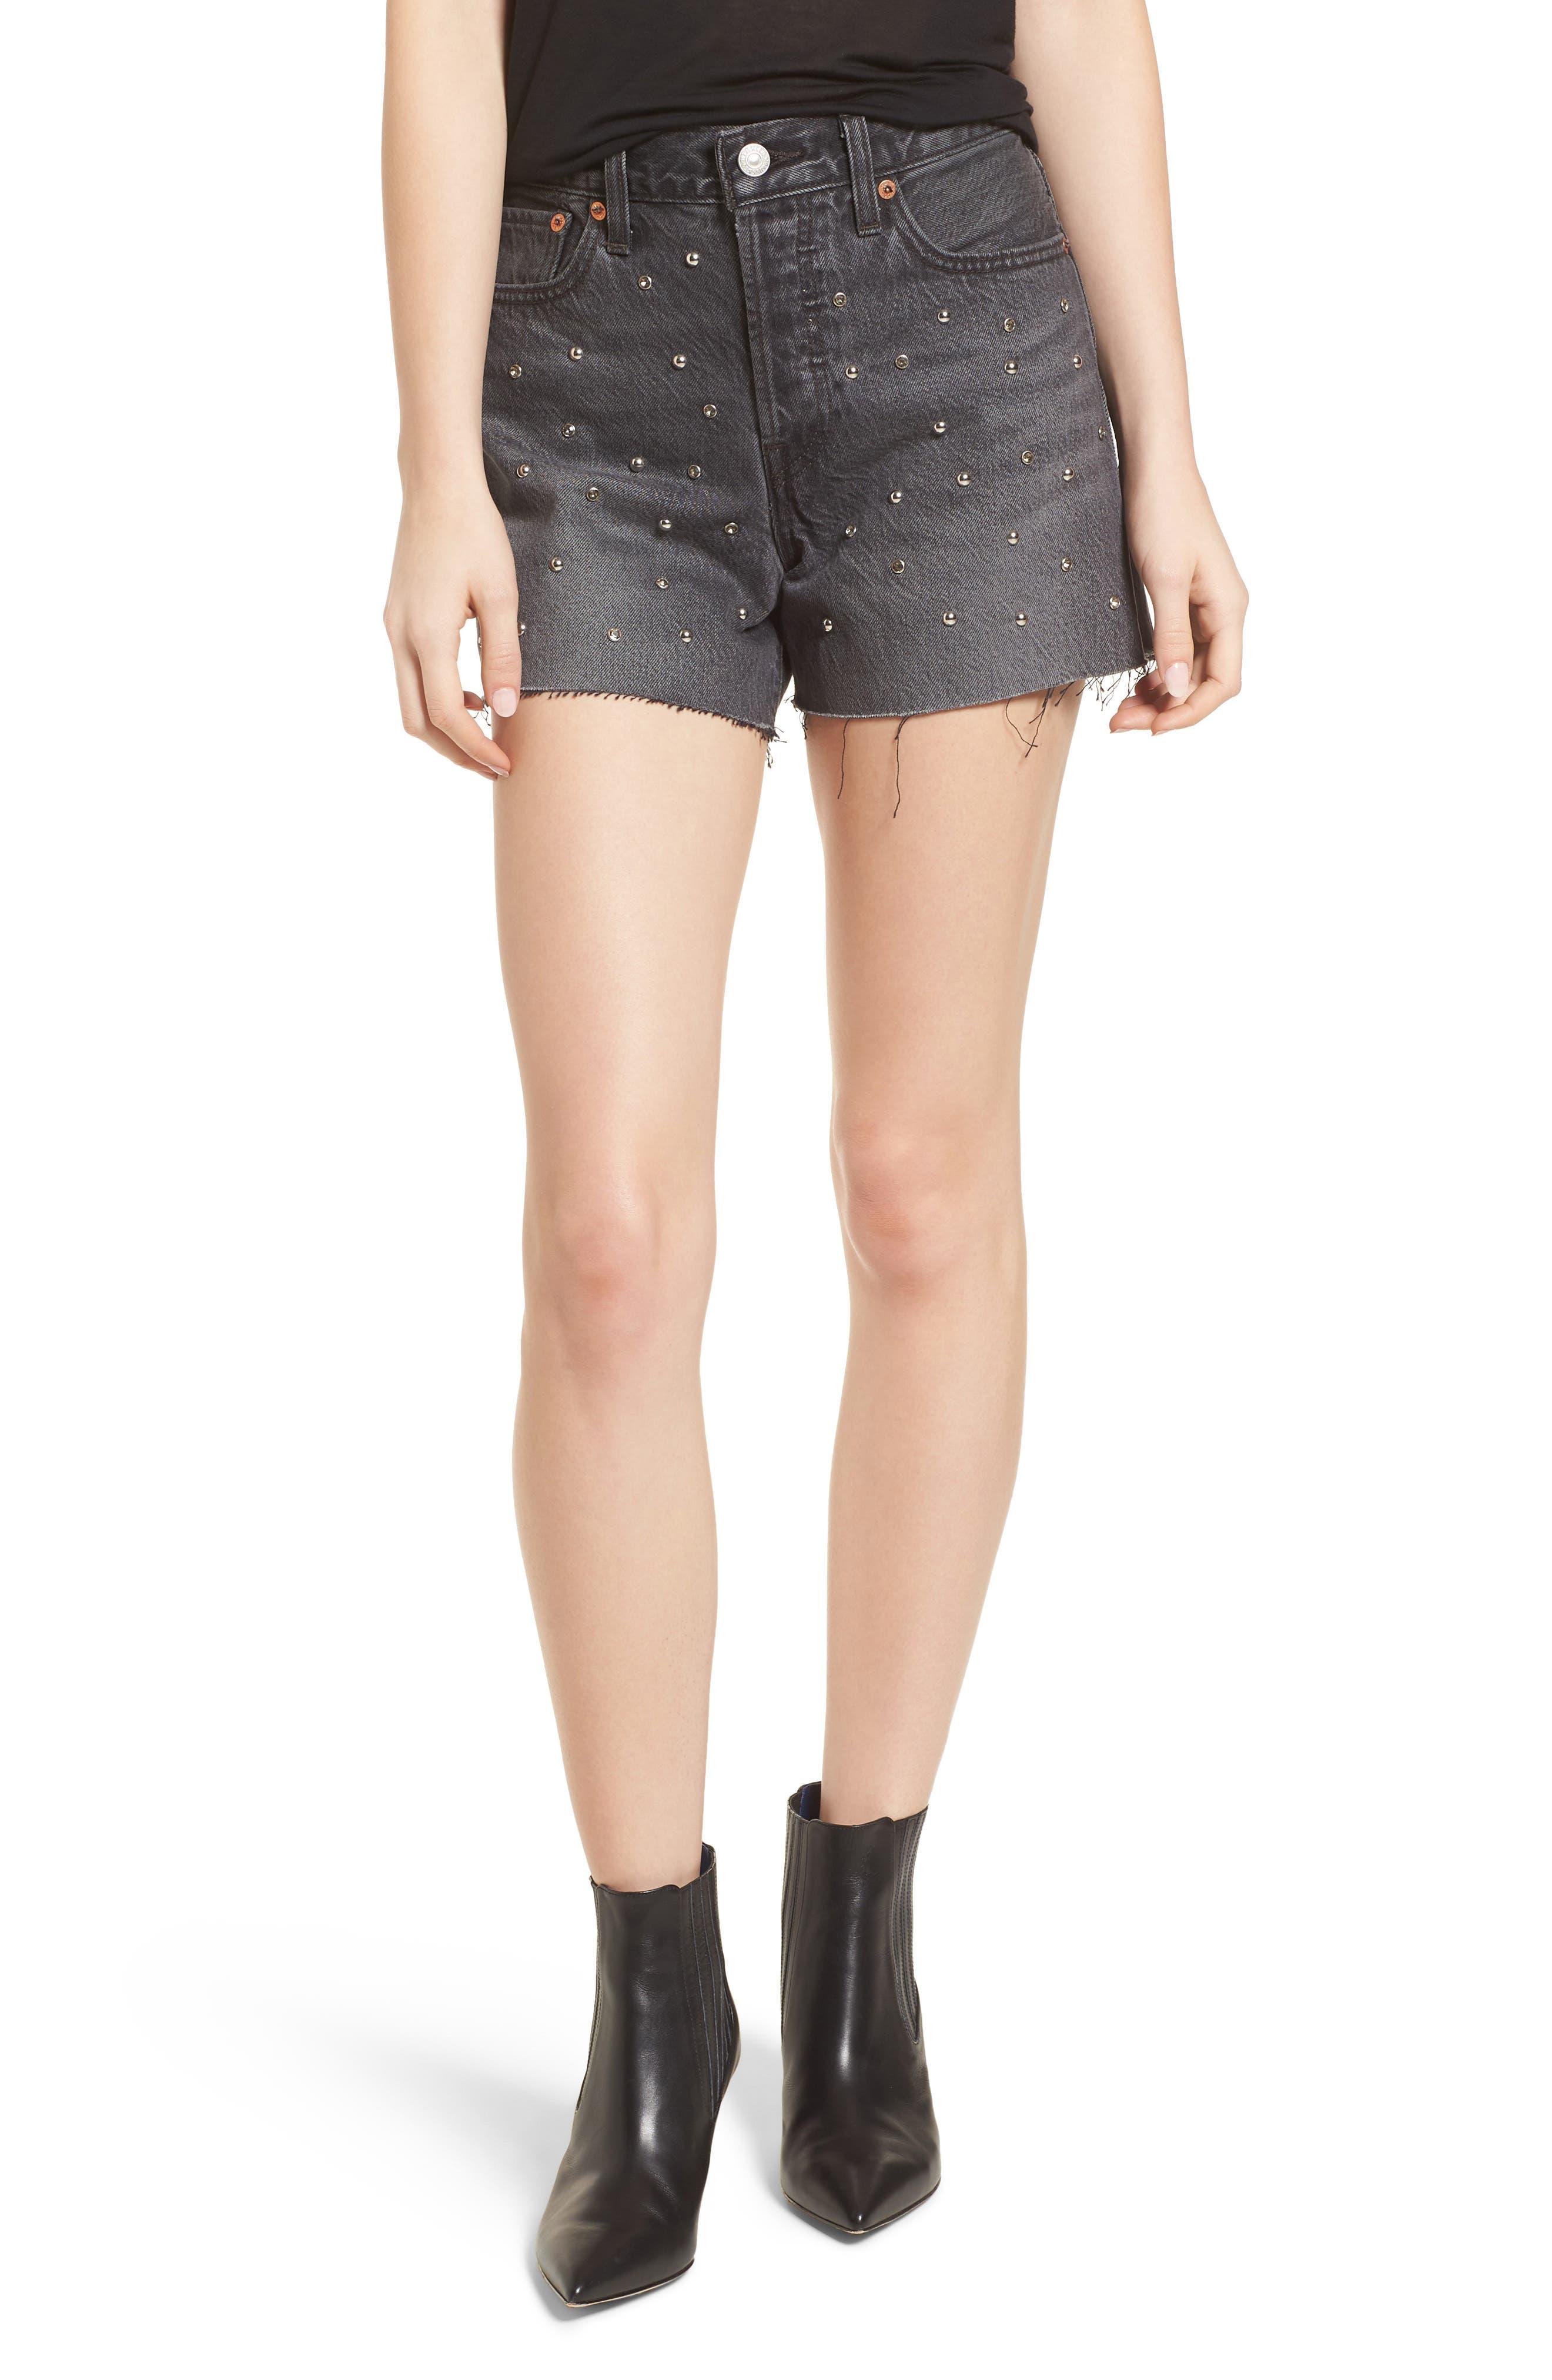 LEVI'S<SUP>®</SUP> Wedgie High Waist Cutoff Denim Shorts, Main, color, 005